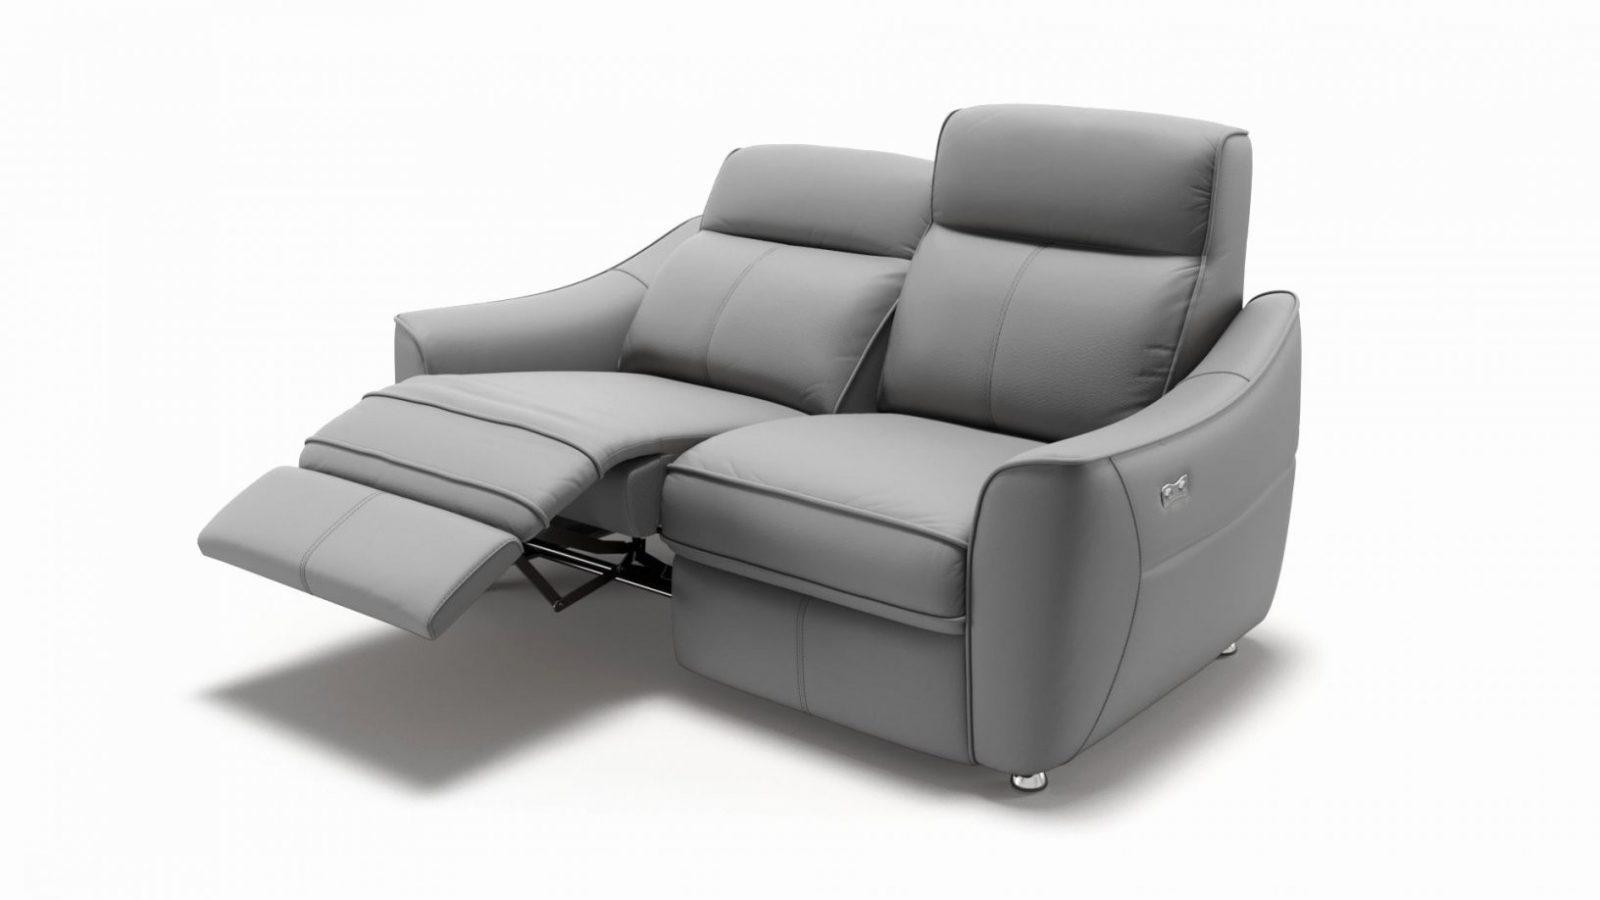 Sofa Attraktiv 2 Sitzer City Sofa Mit Relaxfunktion Ideen Schick 2 von 2 Sitzer City Sofa Mit Relaxfunktion Photo